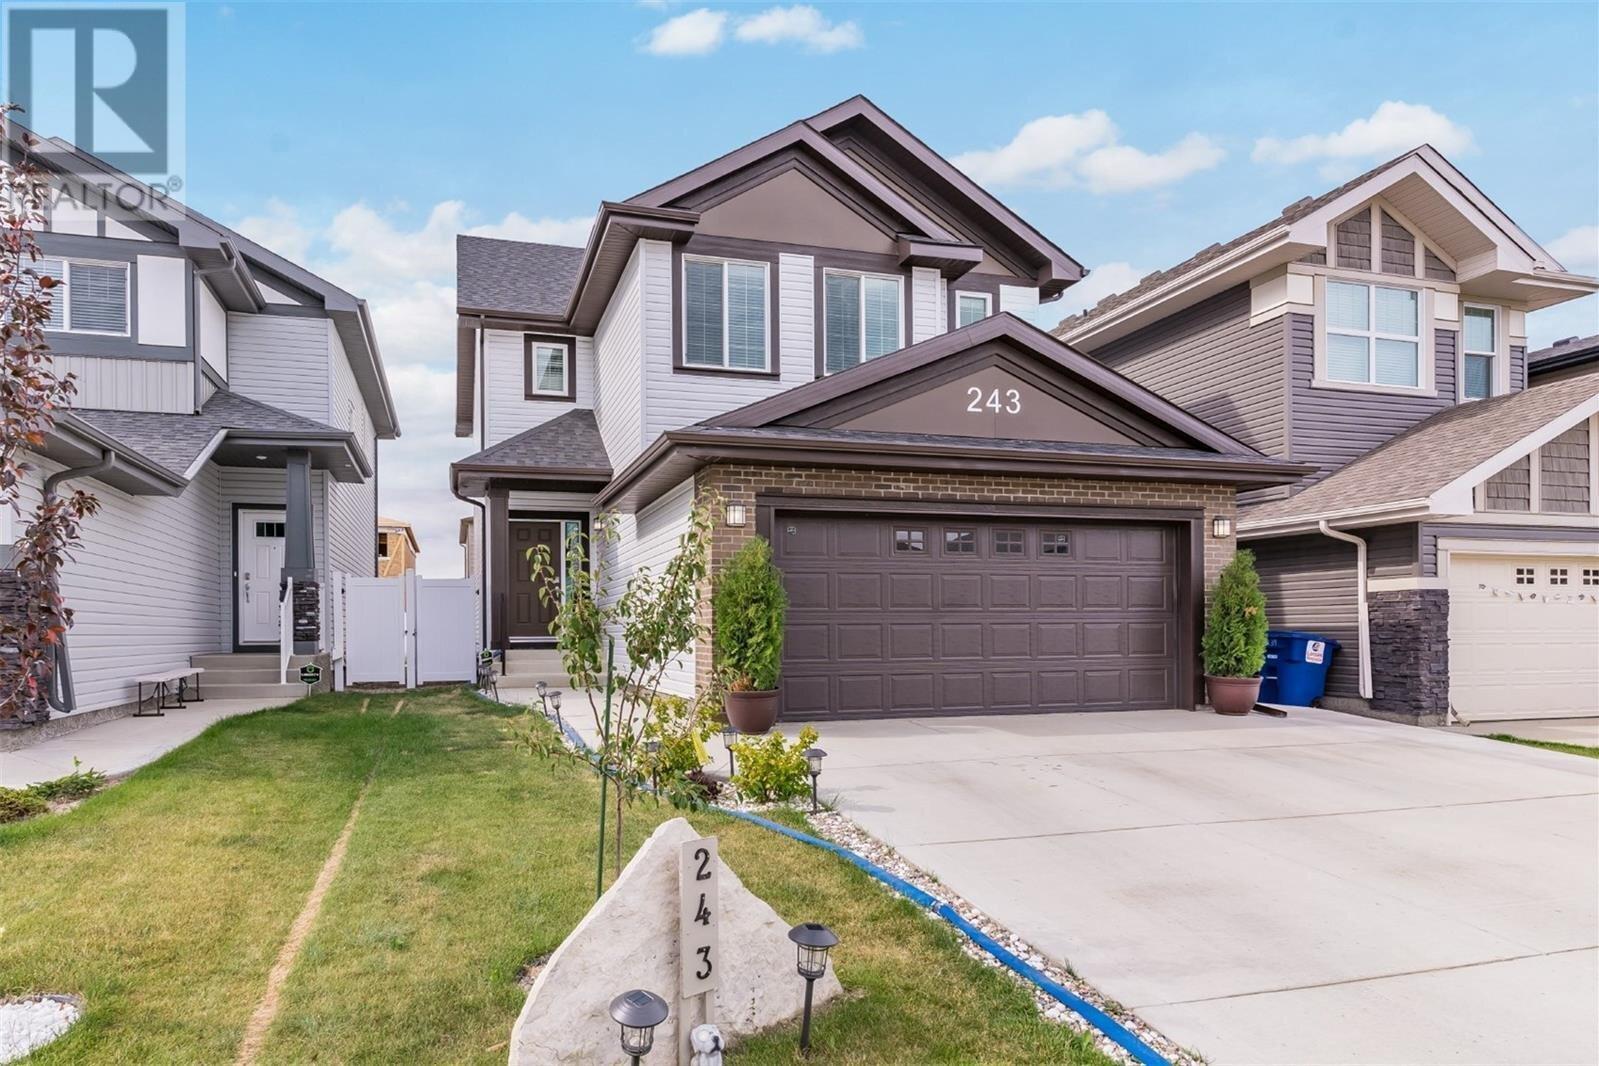 House for sale at 243 Dagnone Ln Saskatoon Saskatchewan - MLS: SK831459